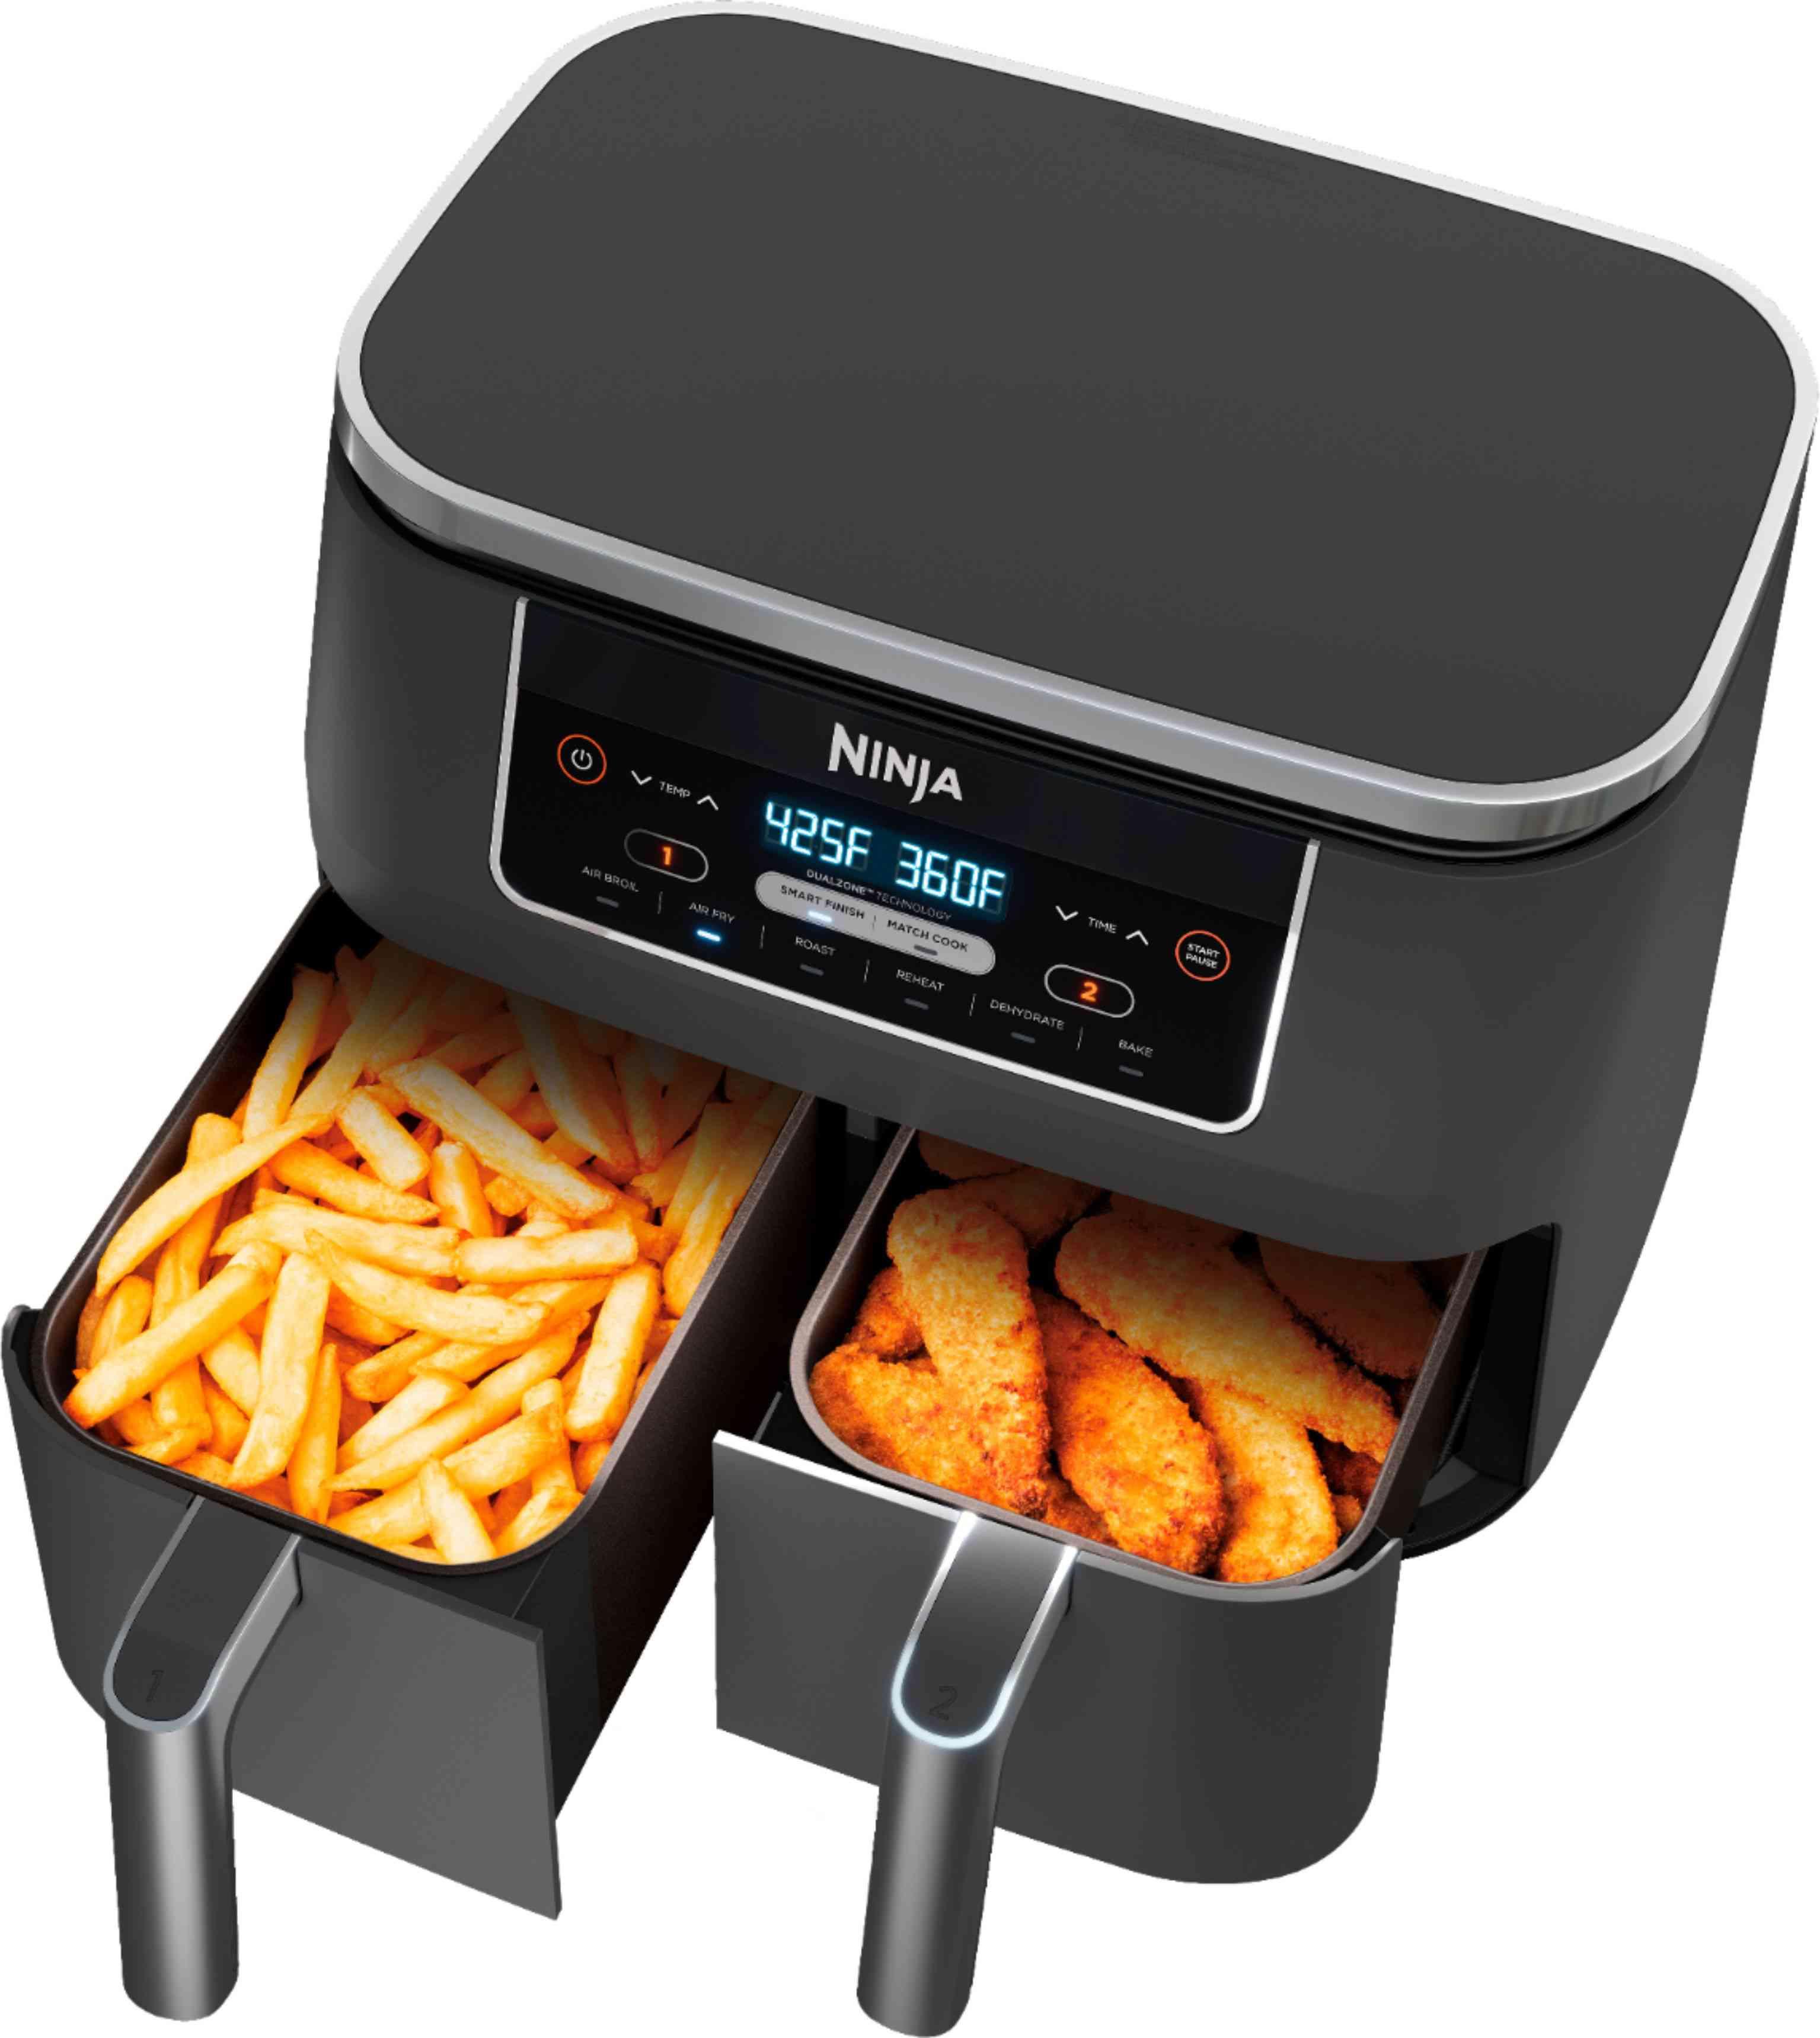 Ninja Foodi 6-in-1 Air Fryer